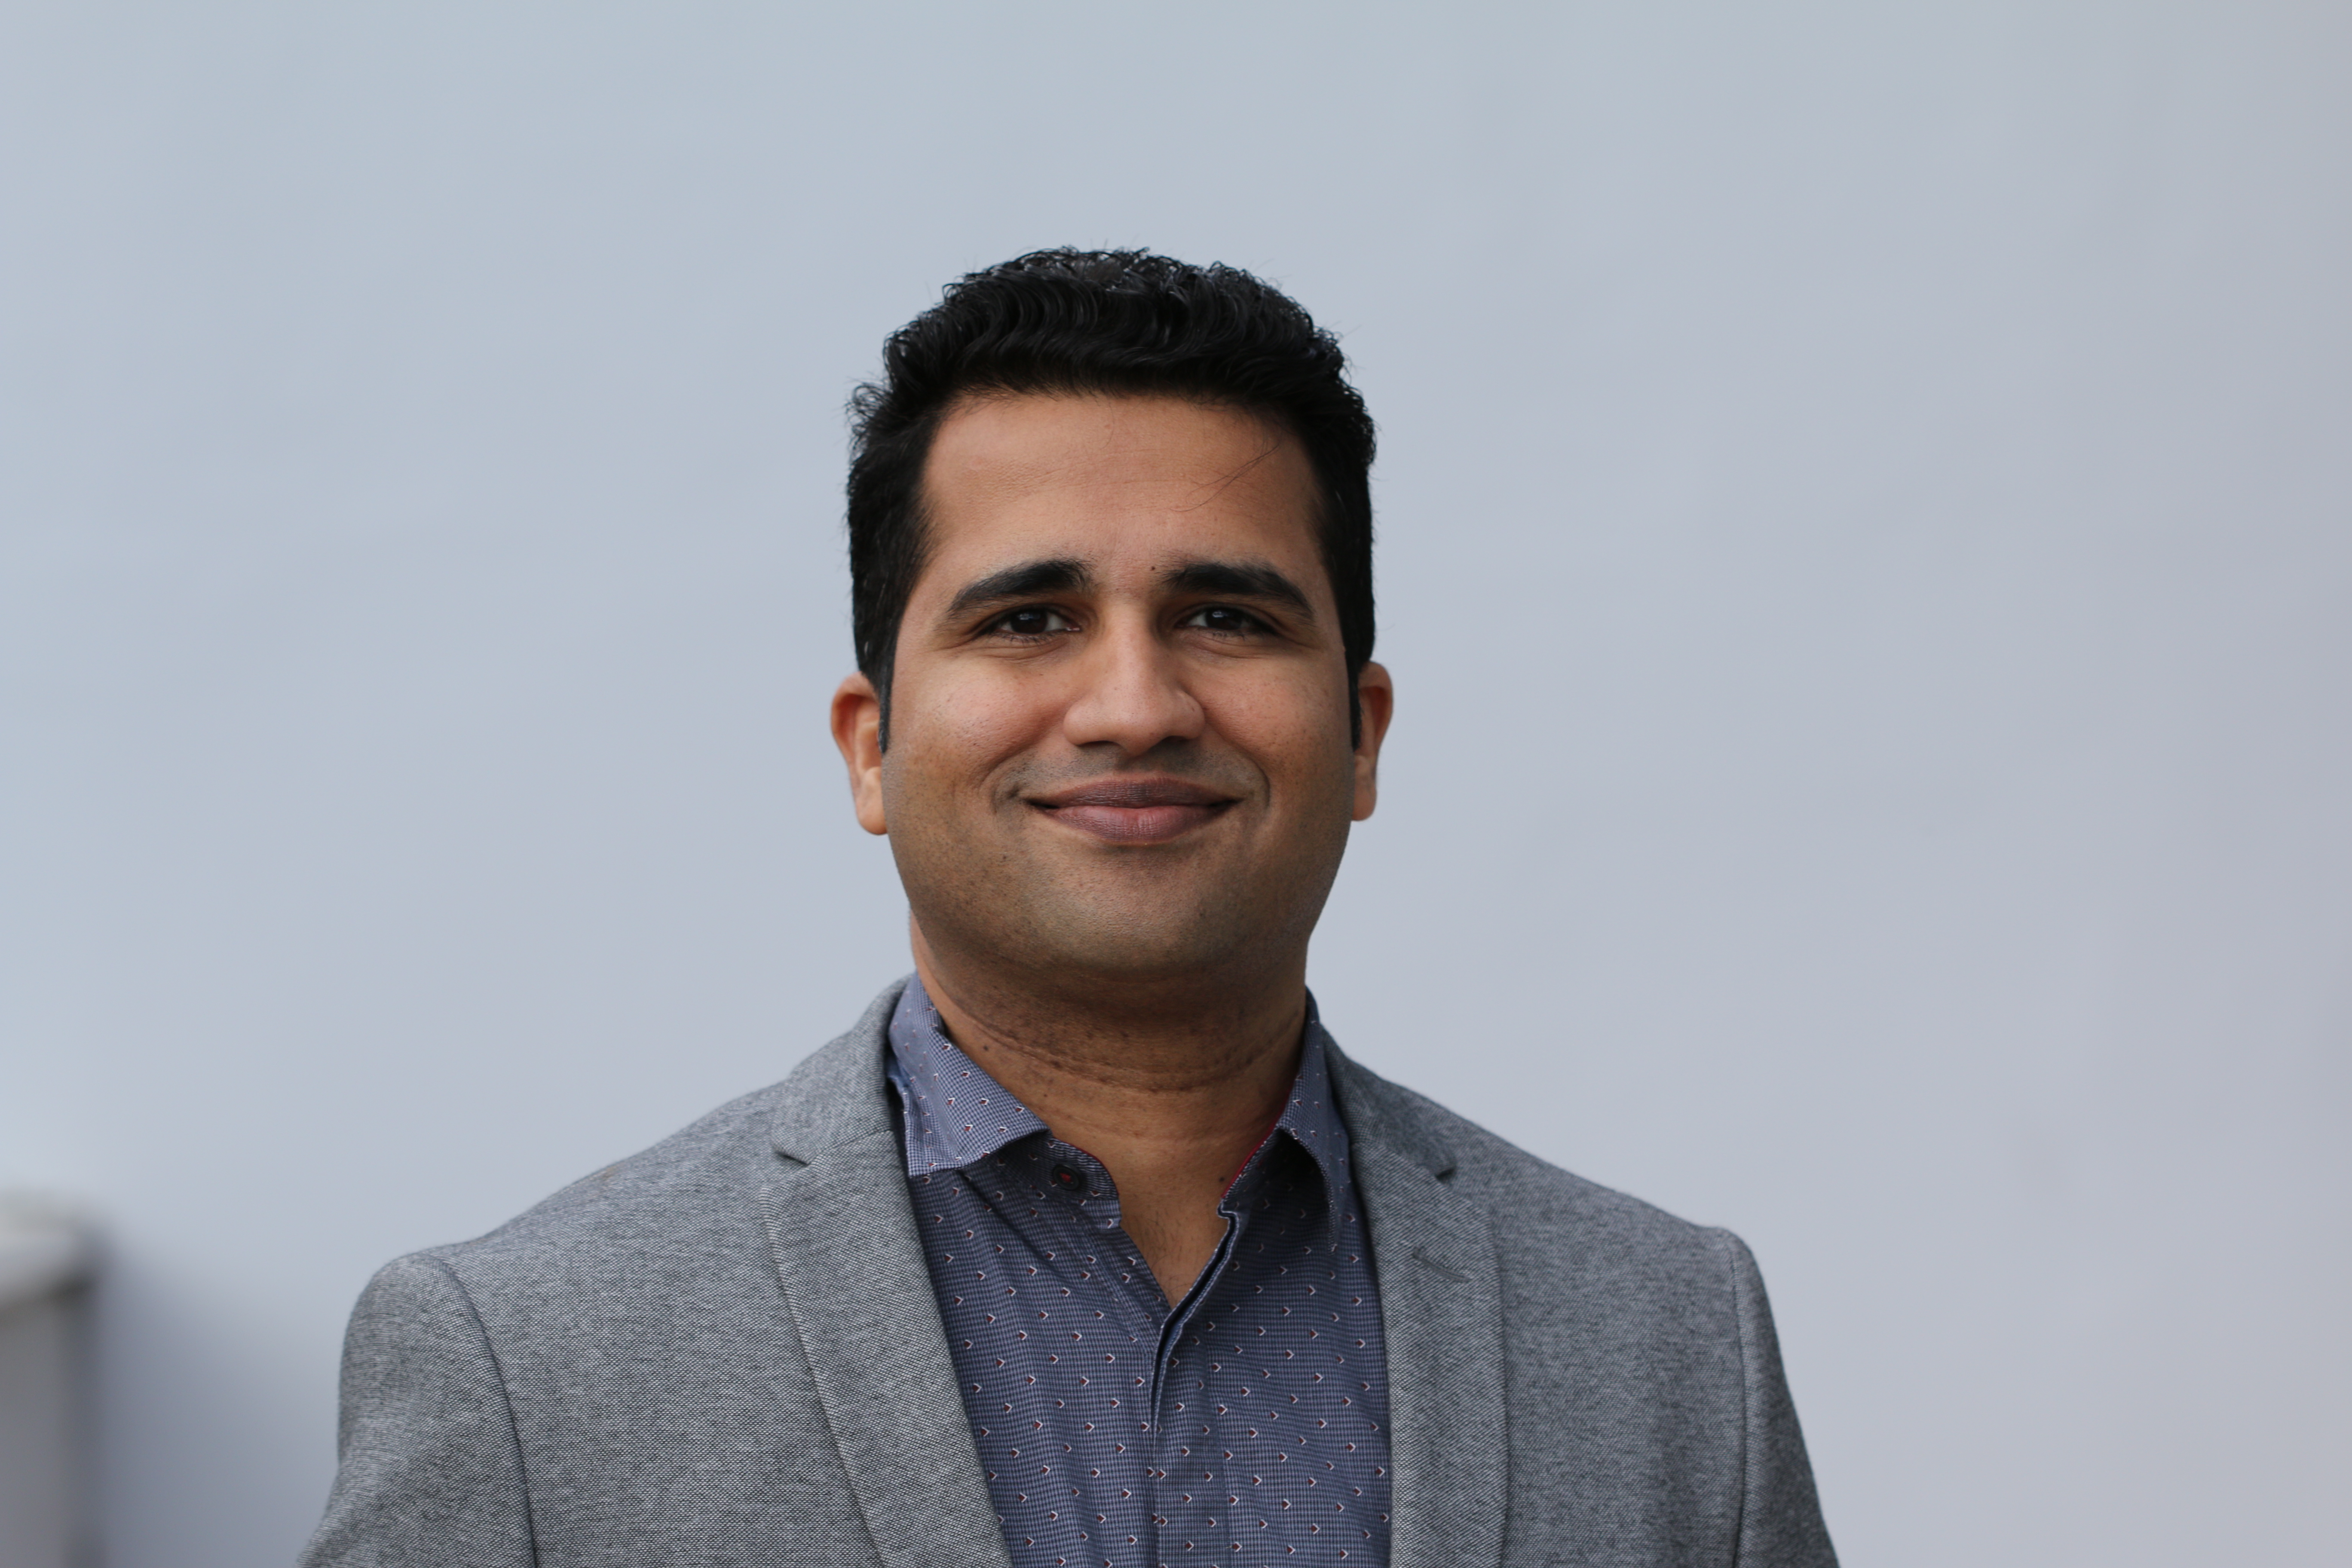 Dr Ravi Chandra Bakaraju